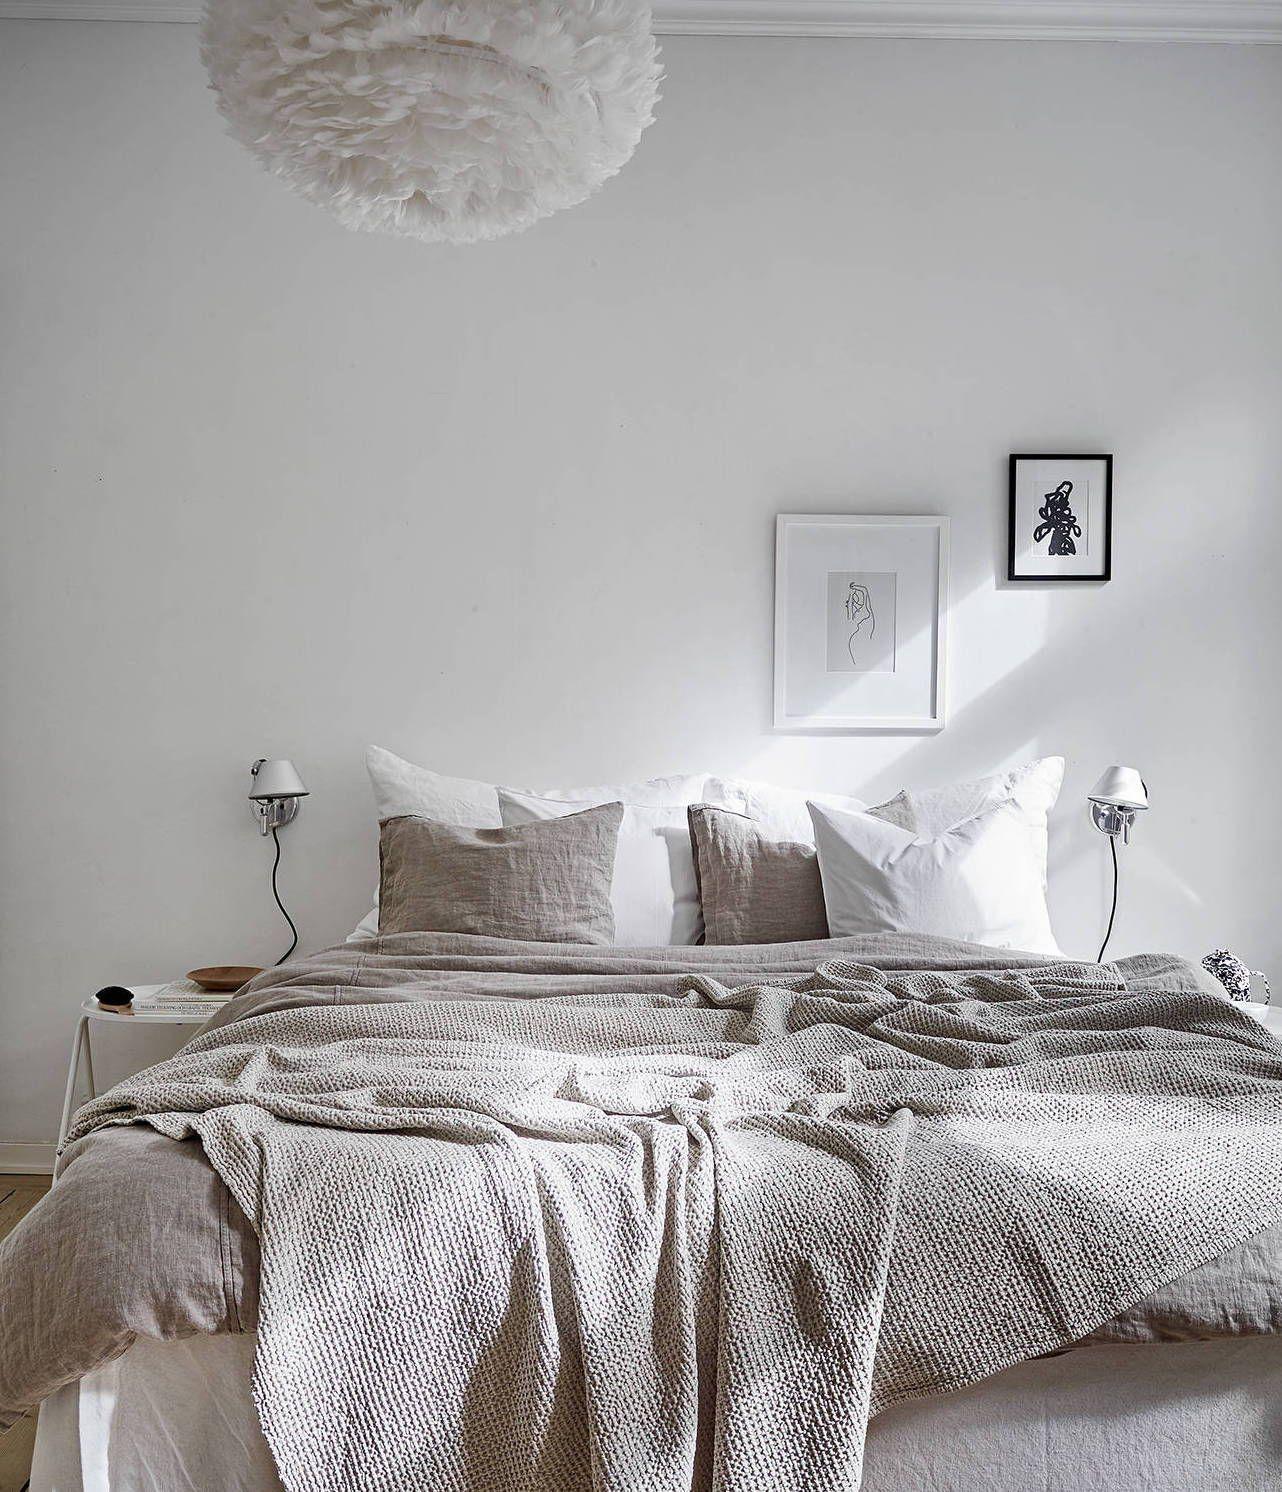 77 Really Cool Living Room Lighting Tips Tricks Ideas: Interior Design / Home Decor